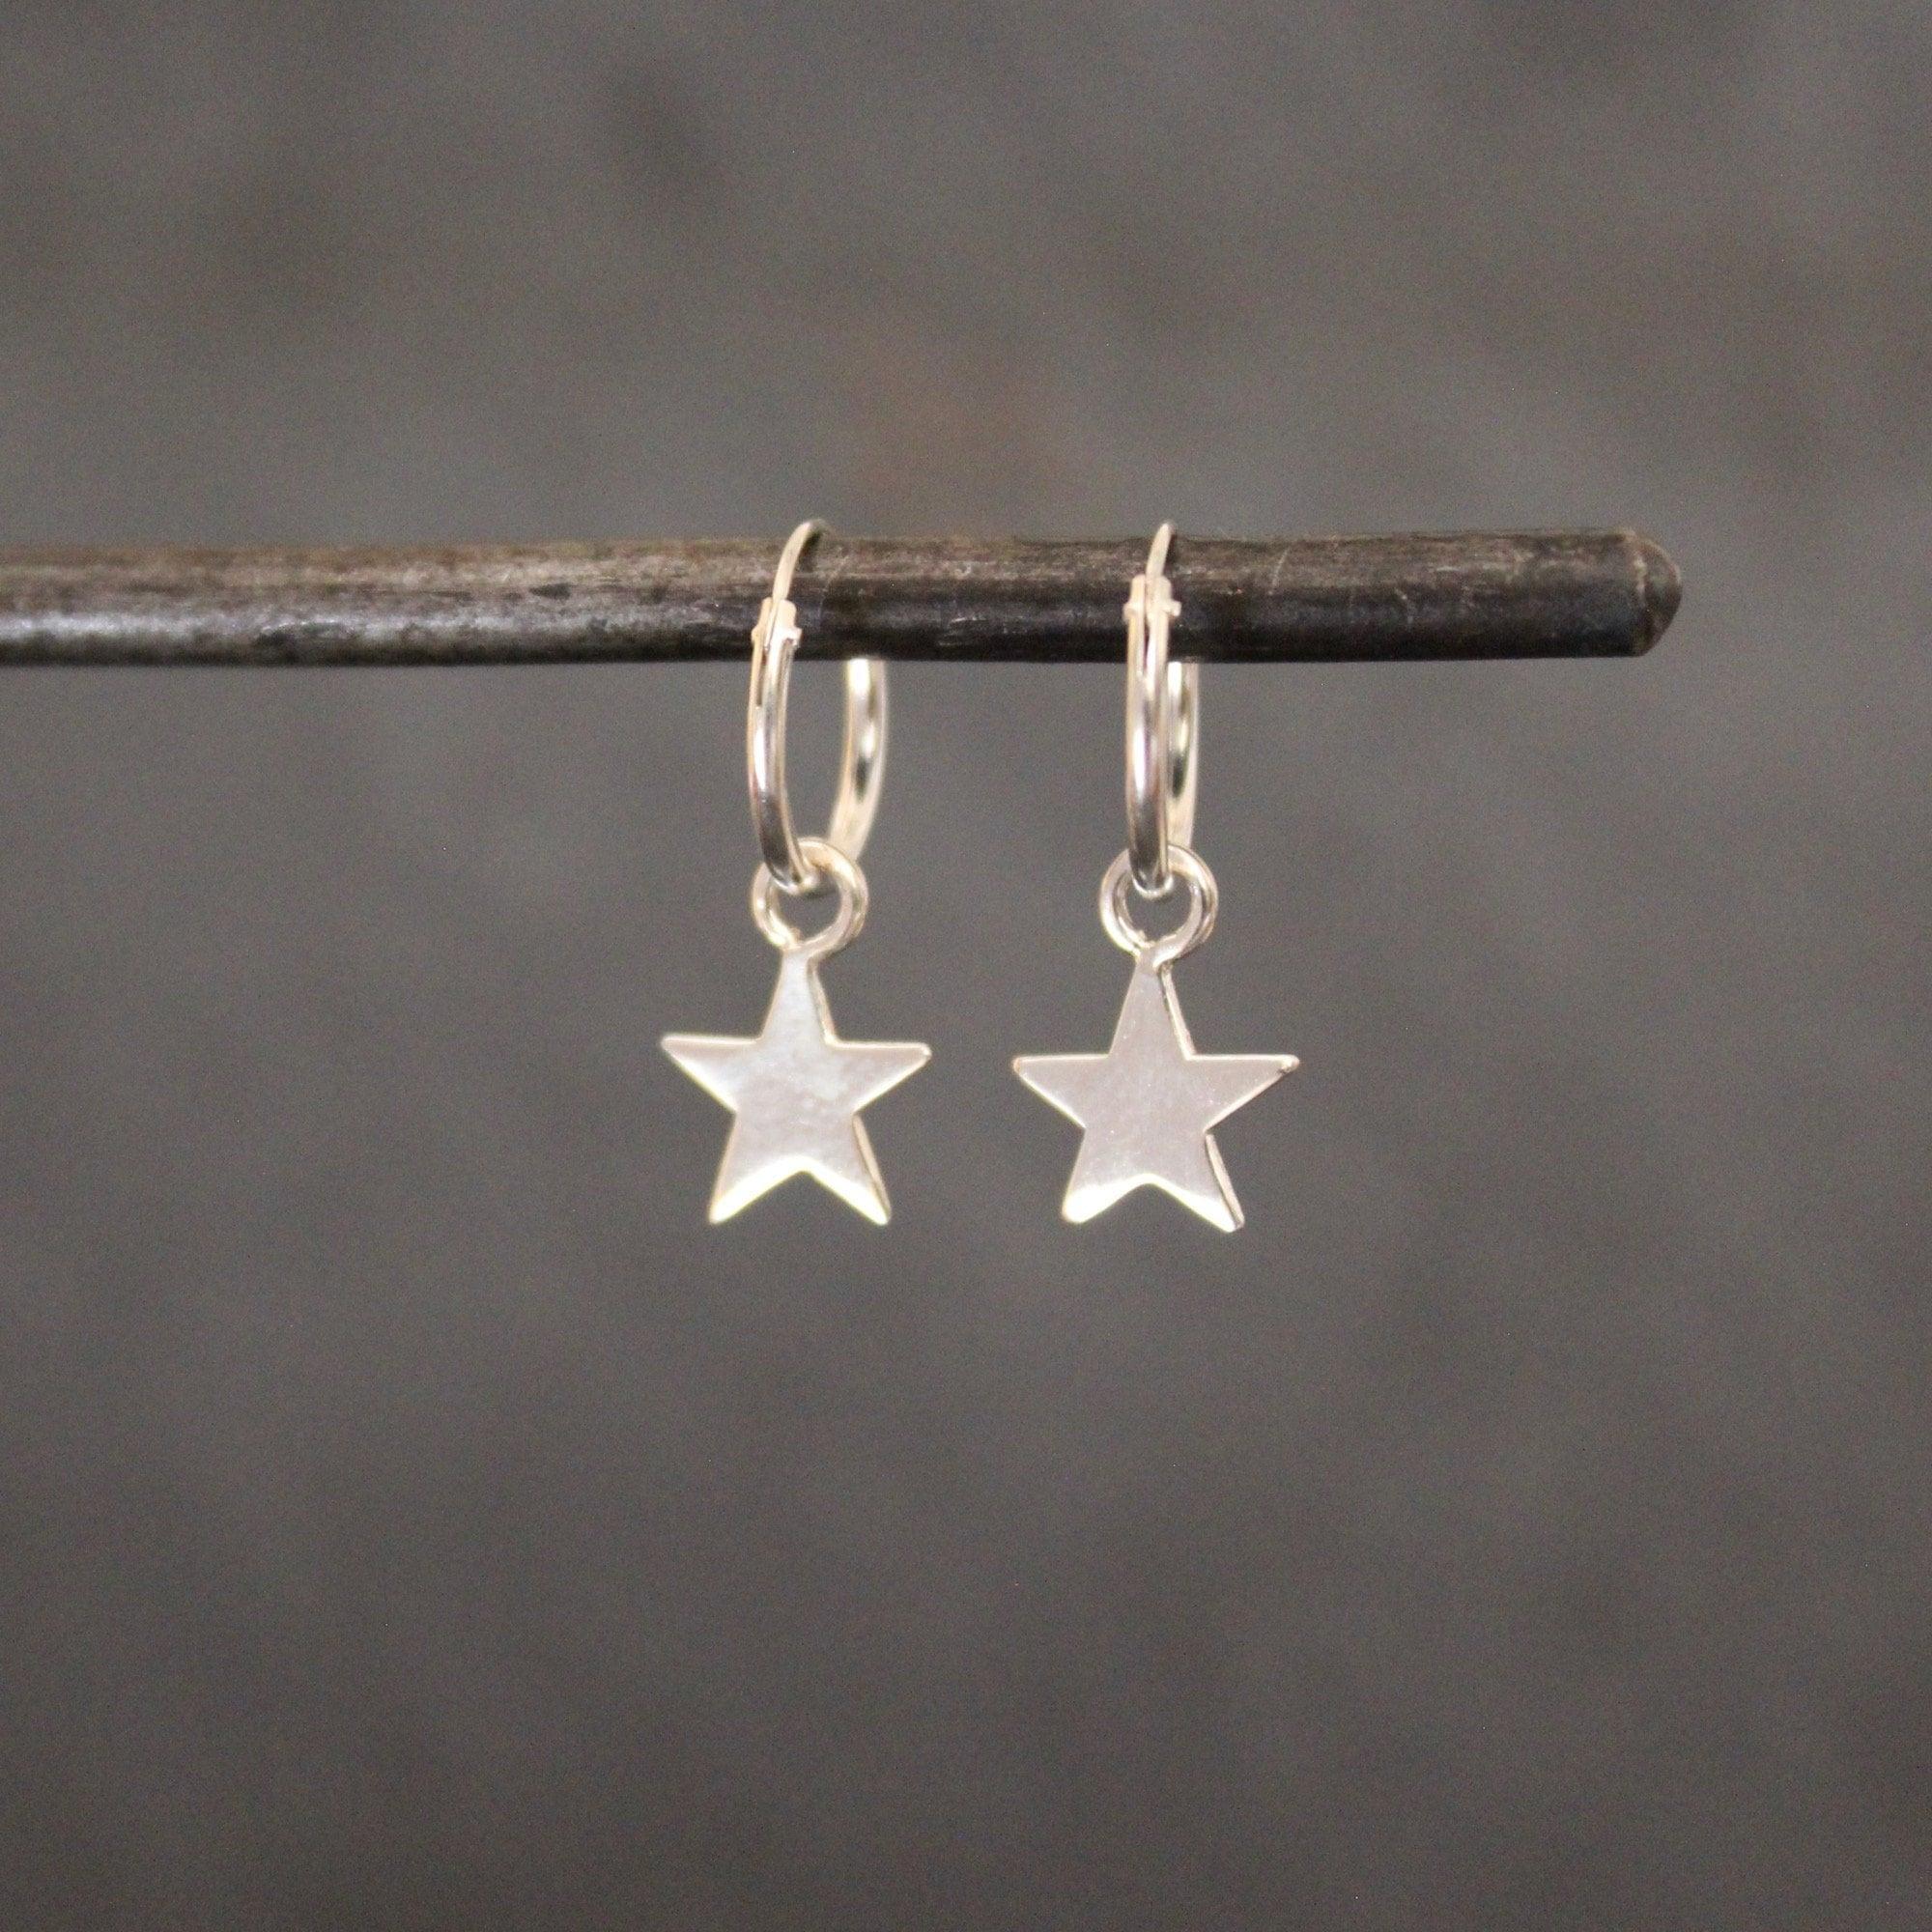 Boho Sterling Silver Star Earrings